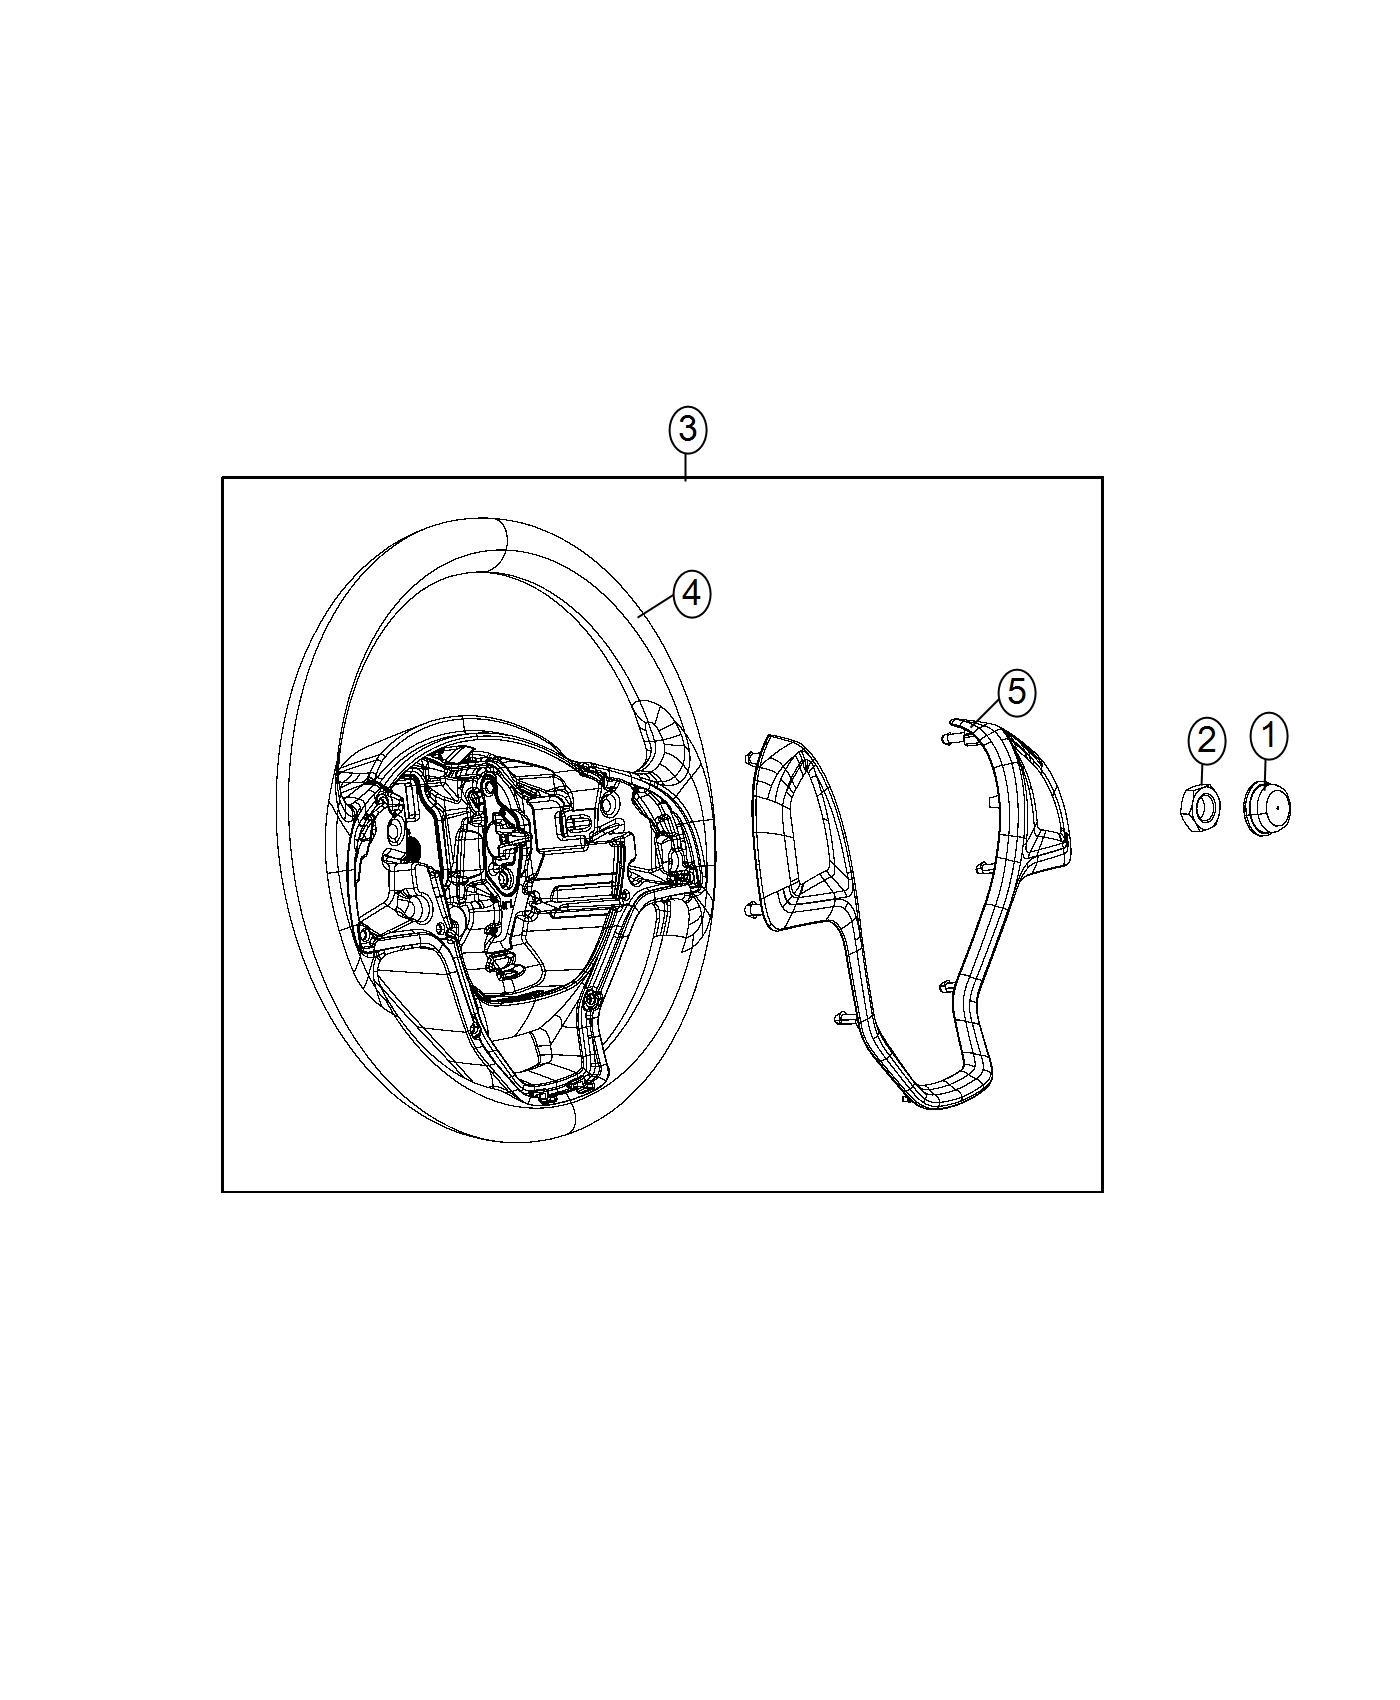 Ram Promaster City Wagon Wheel Steering Trim No Description Available Color O0